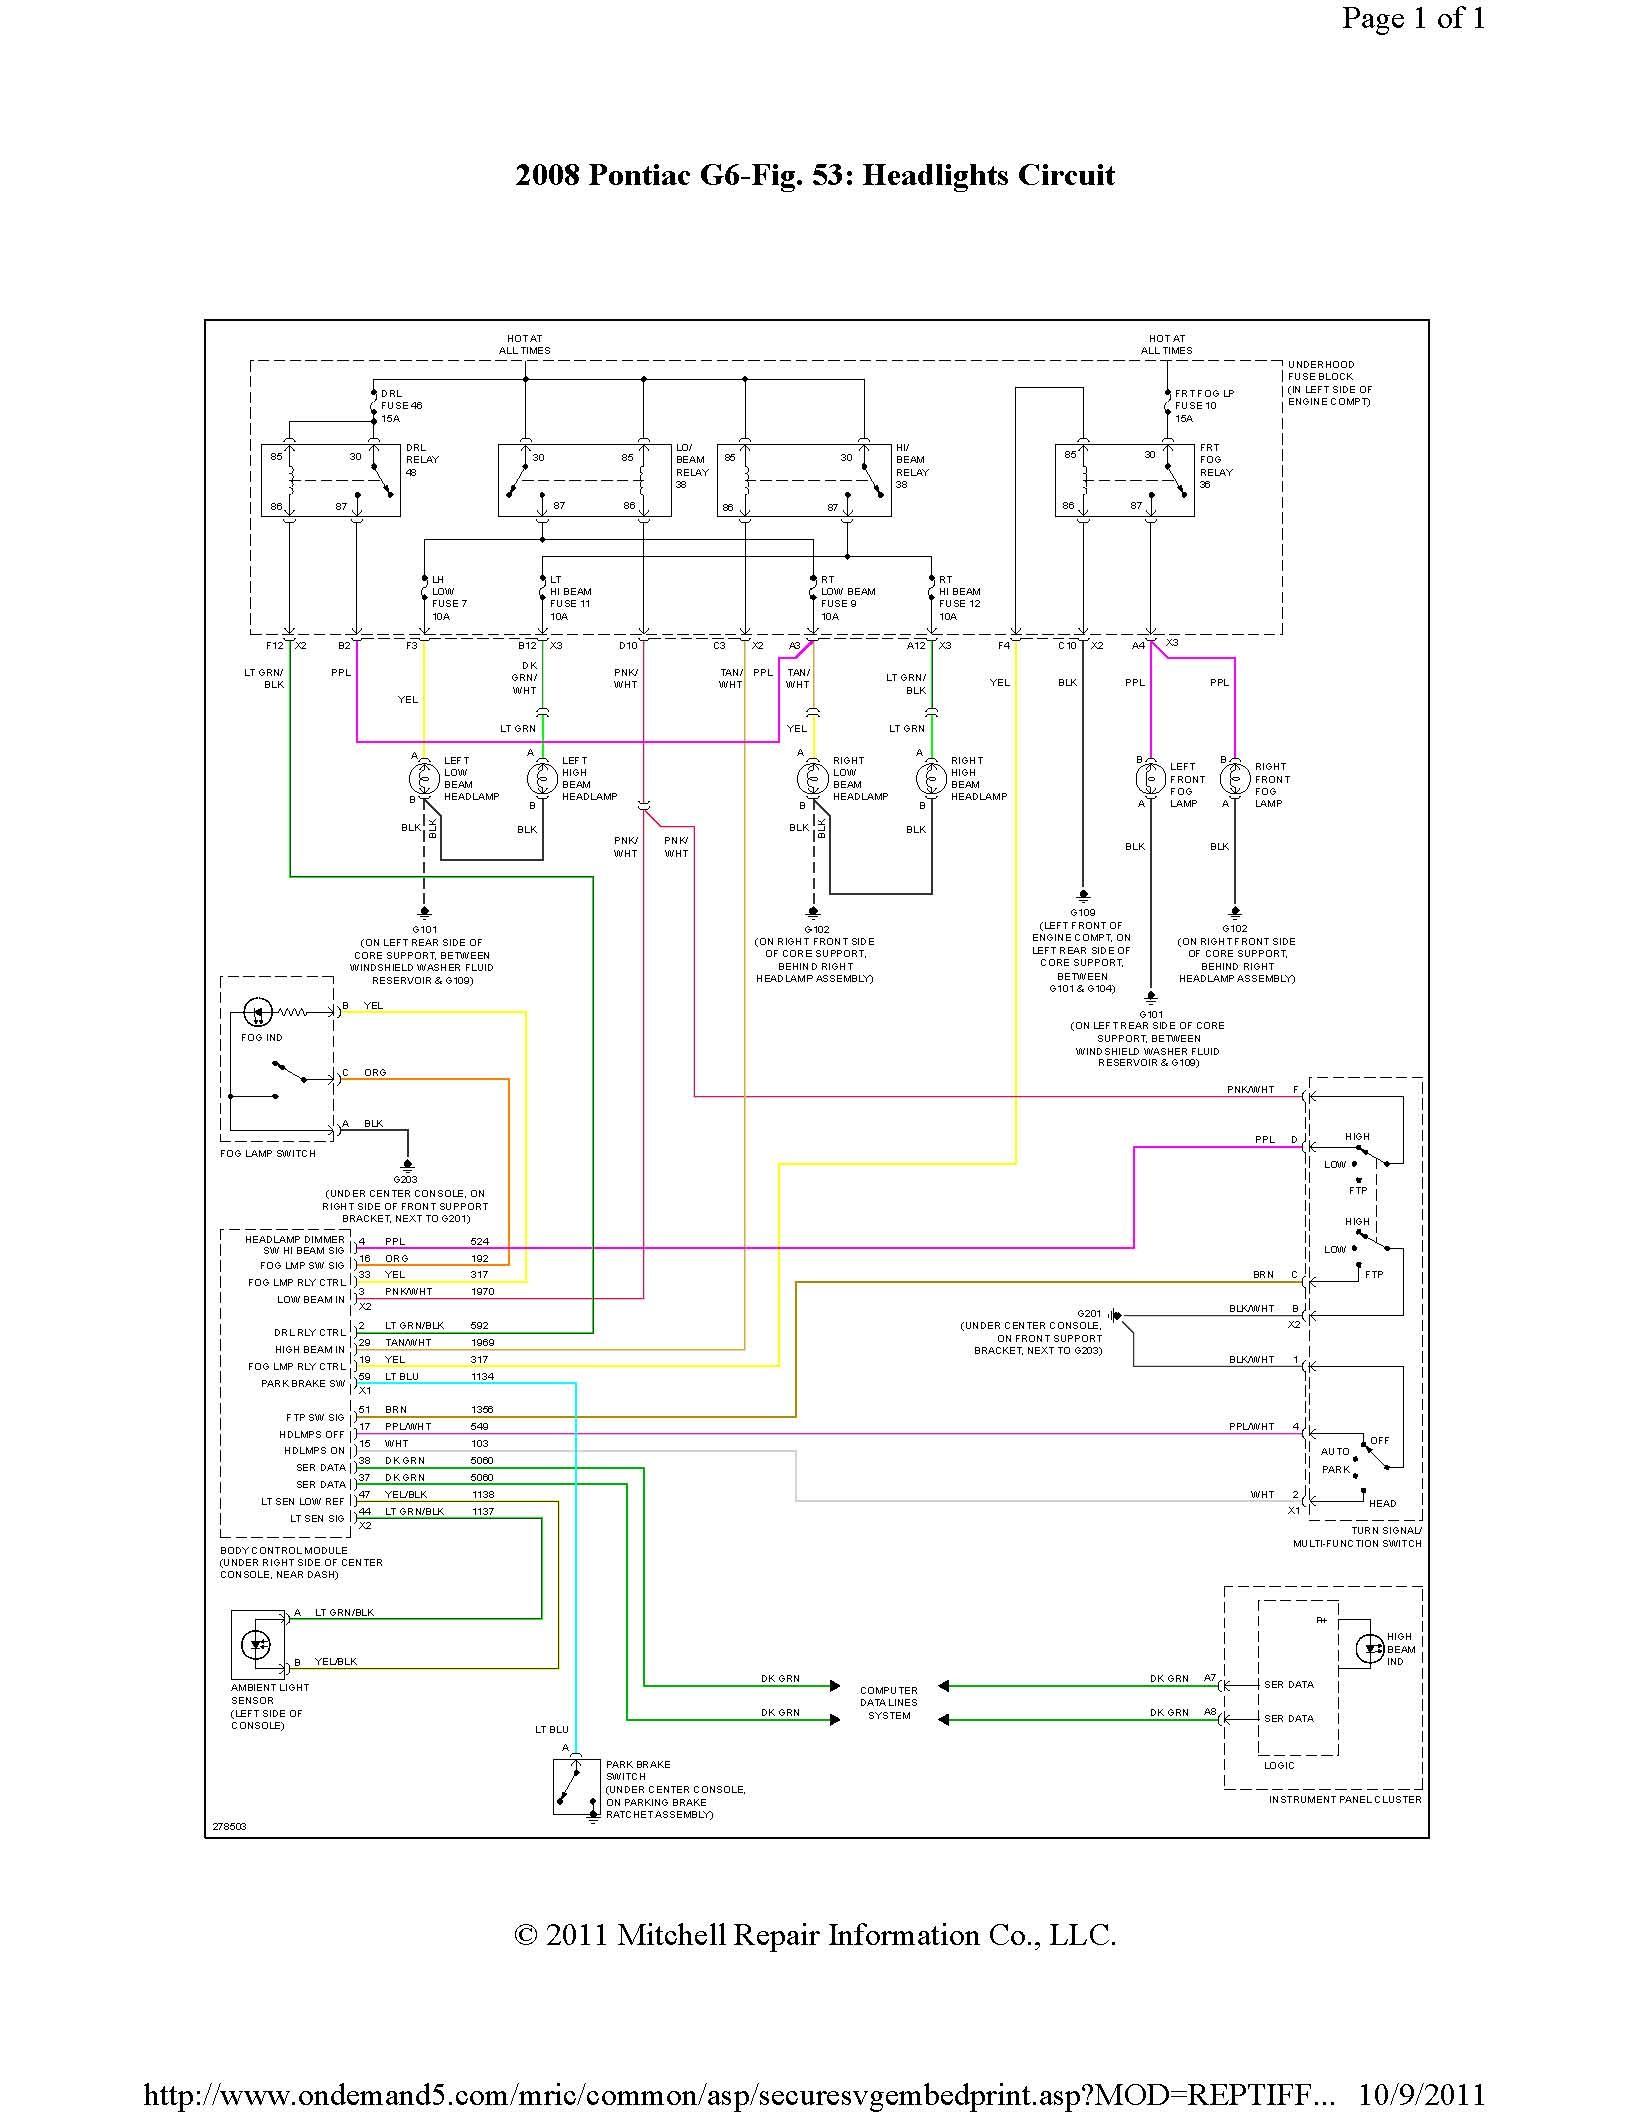 wiring diagram for 2006 pontiac g6 | wiring diagram outgive  tenutasantelisabetta.it